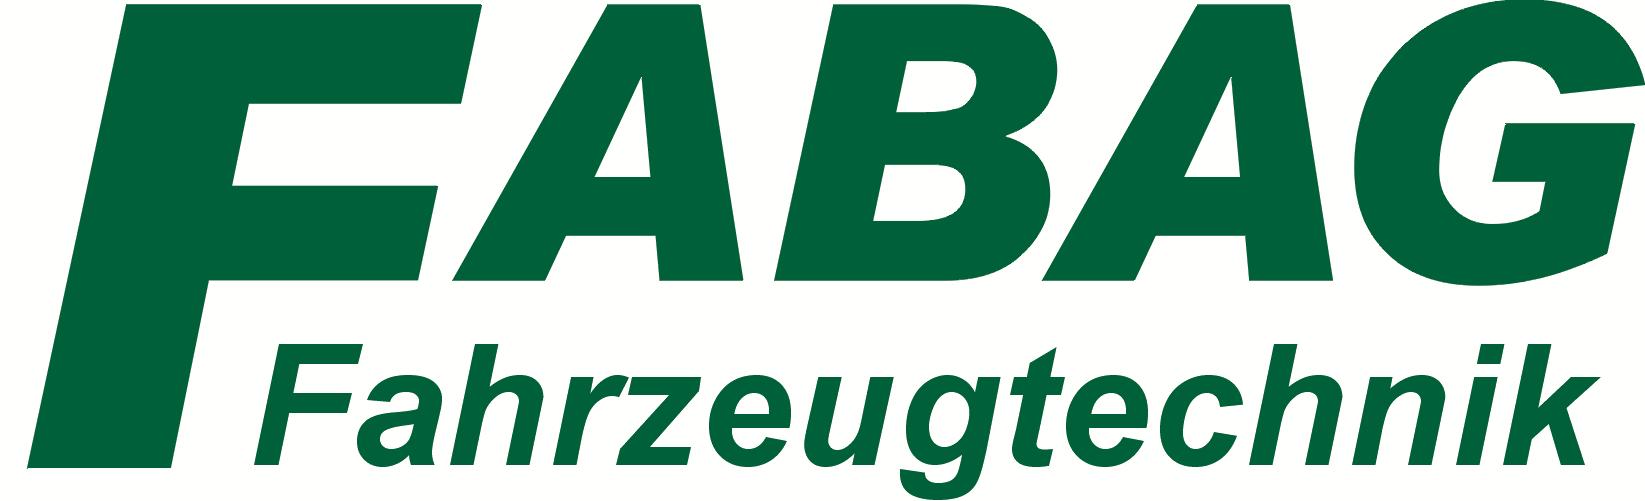 logo FABAG FAHRZEUGTECHNIK